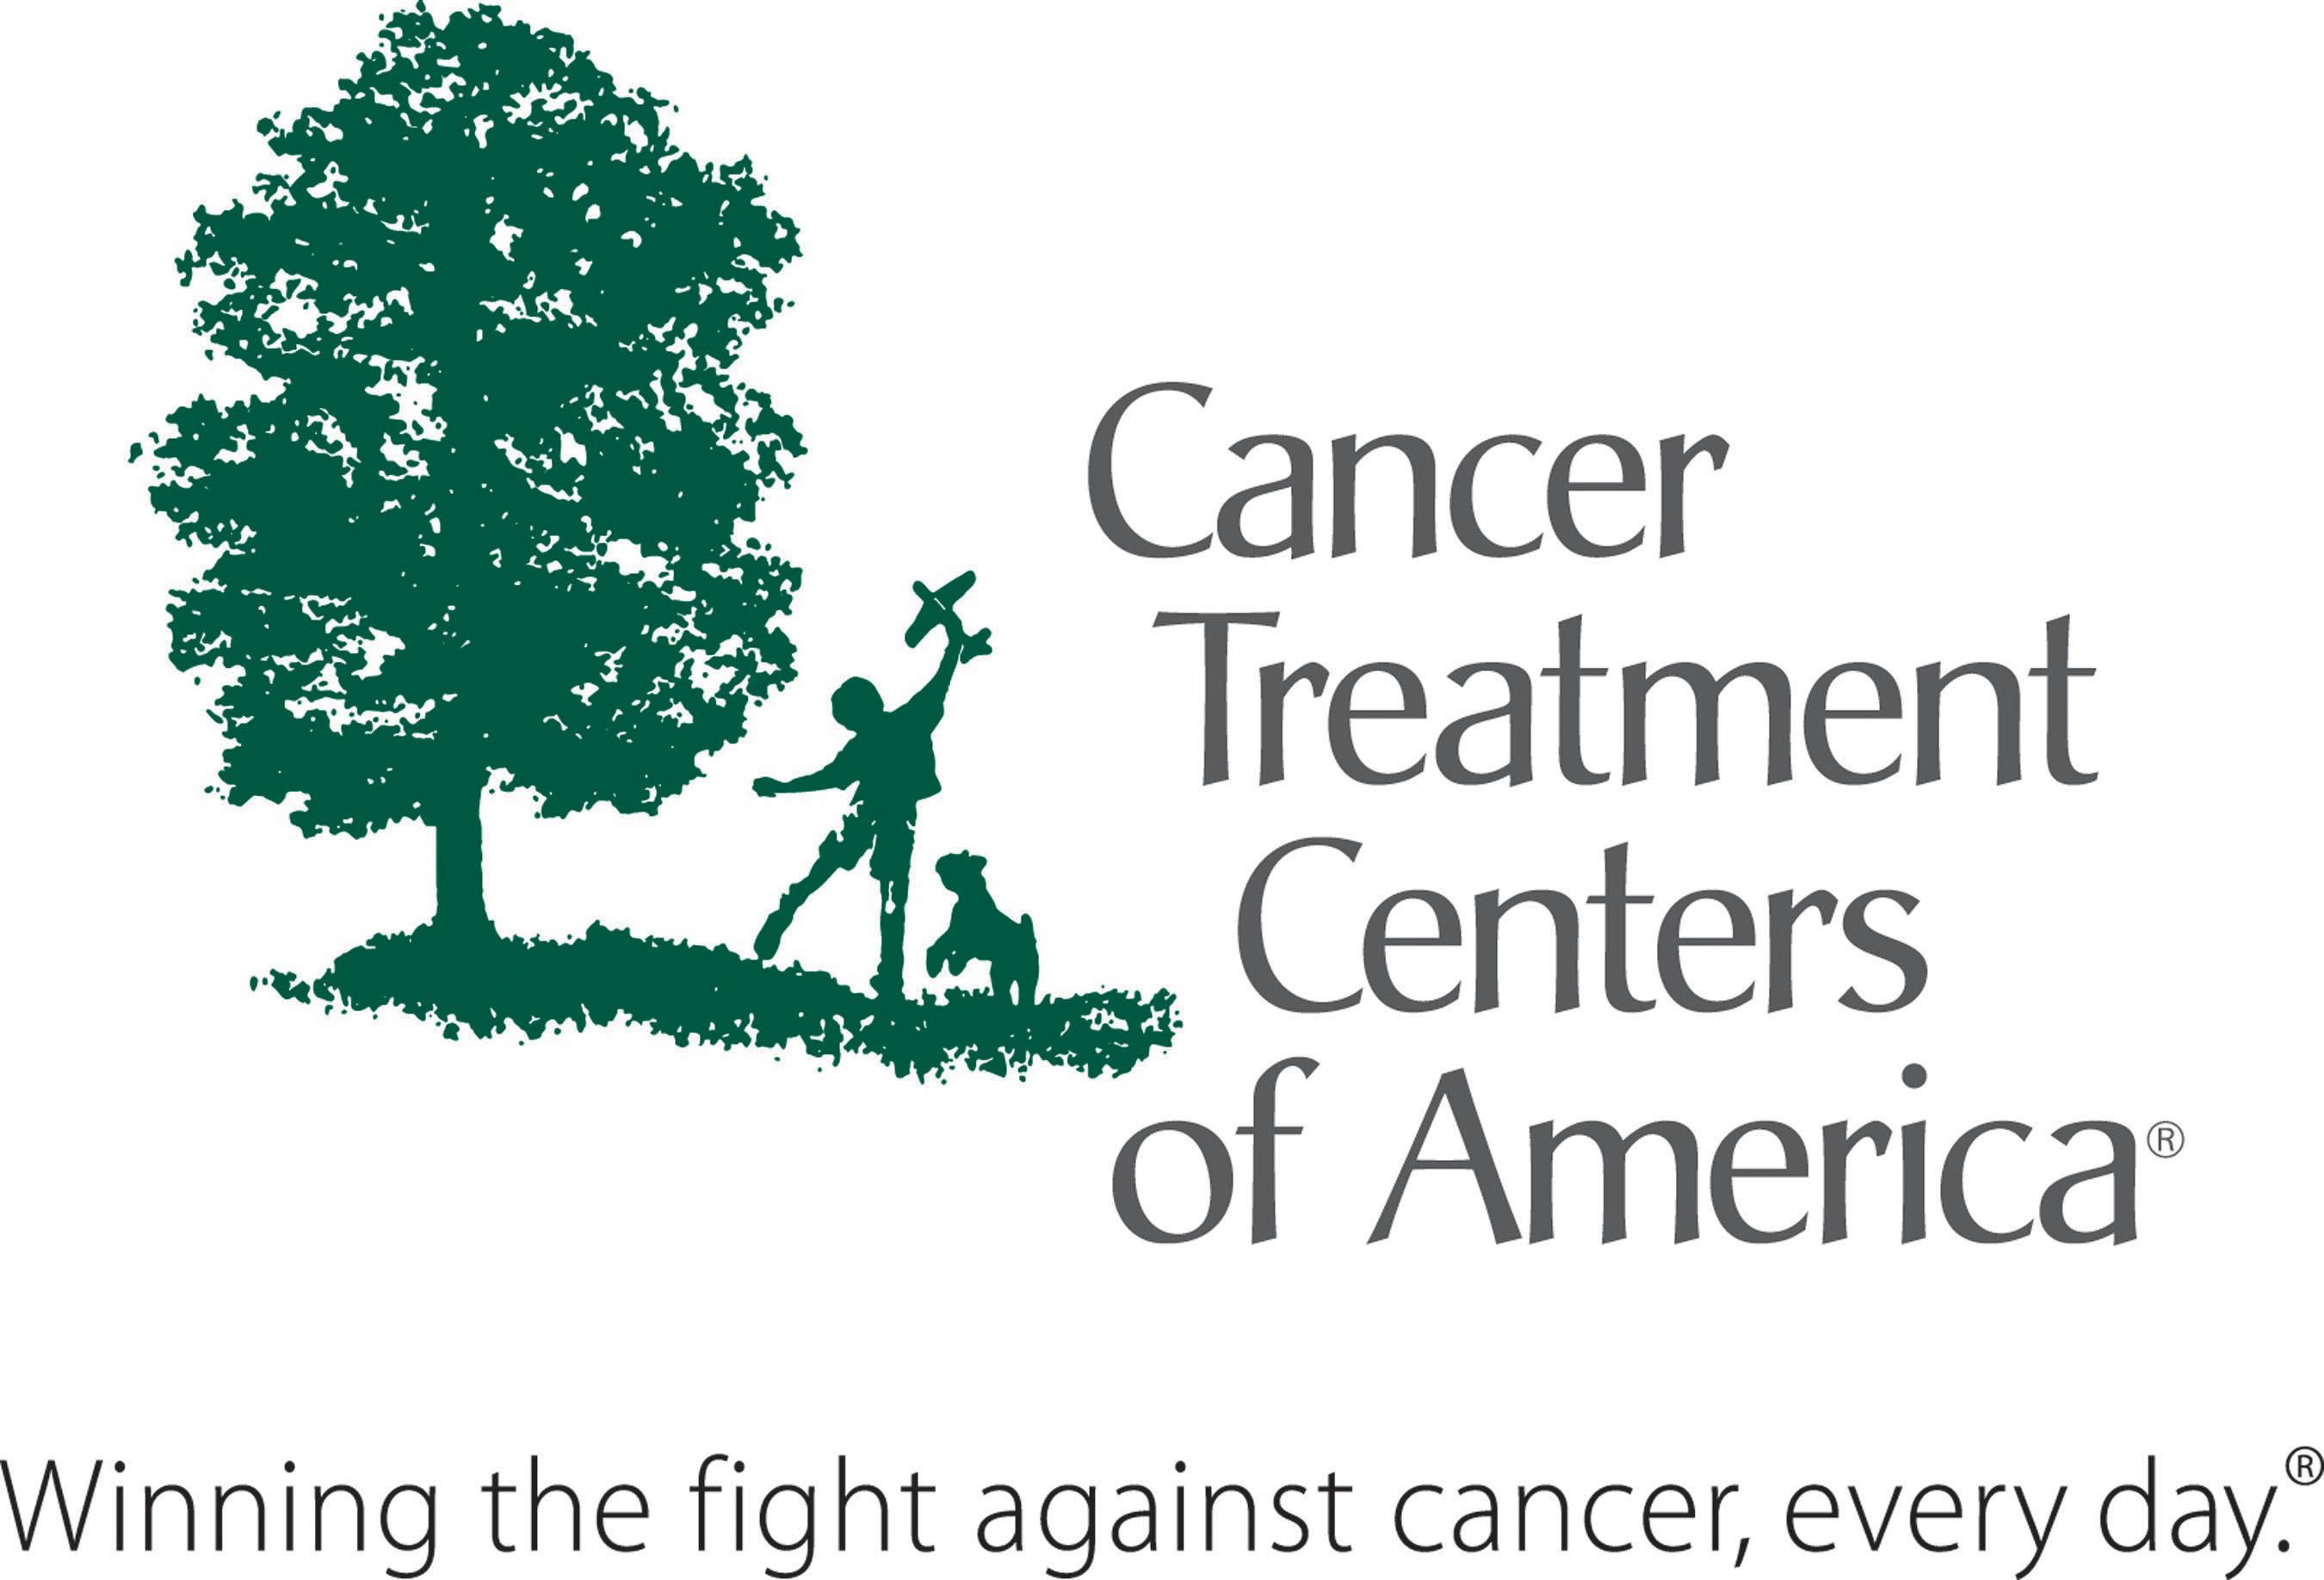 Cancer Treatment Centers Of America logo.